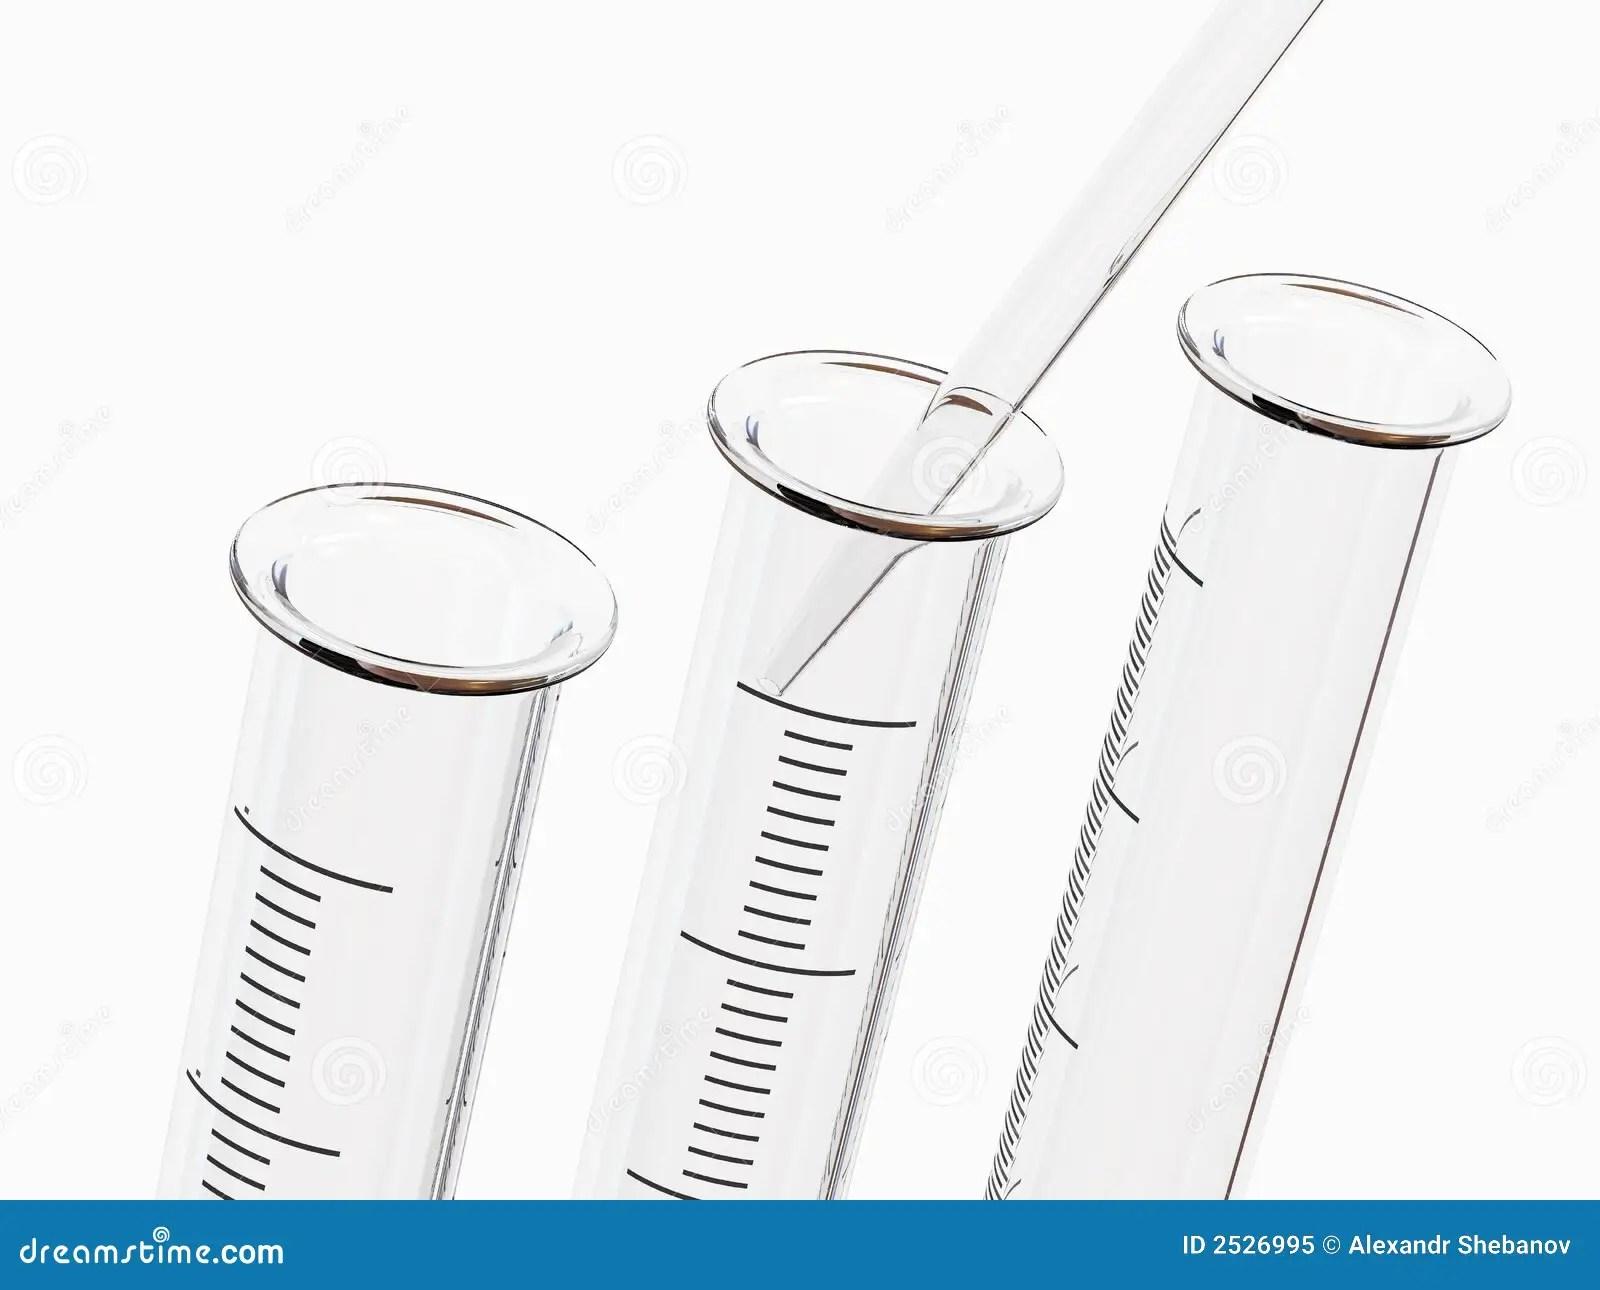 Medical Test Tubes Royalty Free Stock Photo